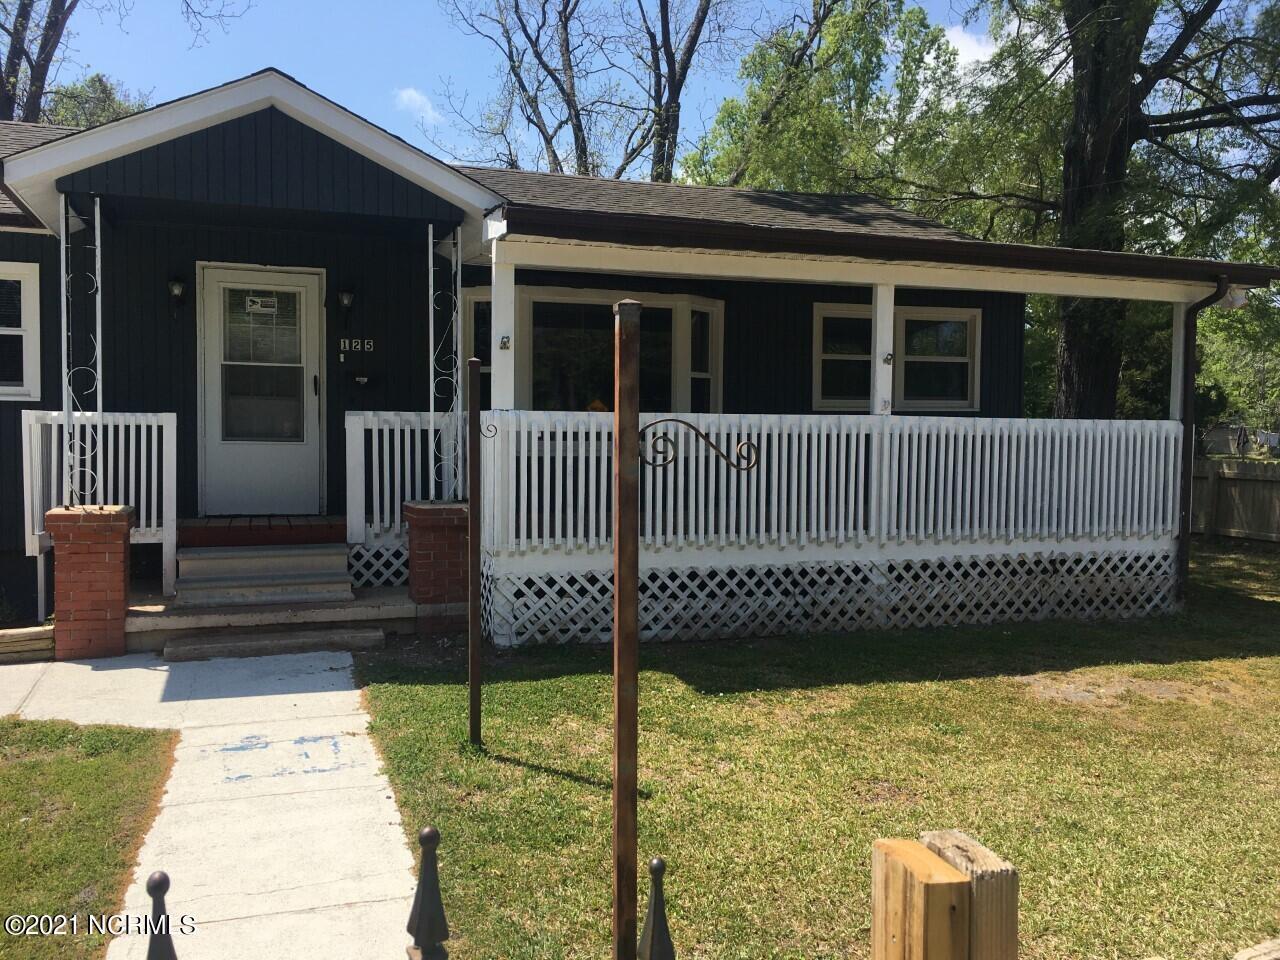 Corner lot, privacy fence, 5 bedroom, 2 bath, enclosed back porch, front porch, privacy fence, detached double car garage.